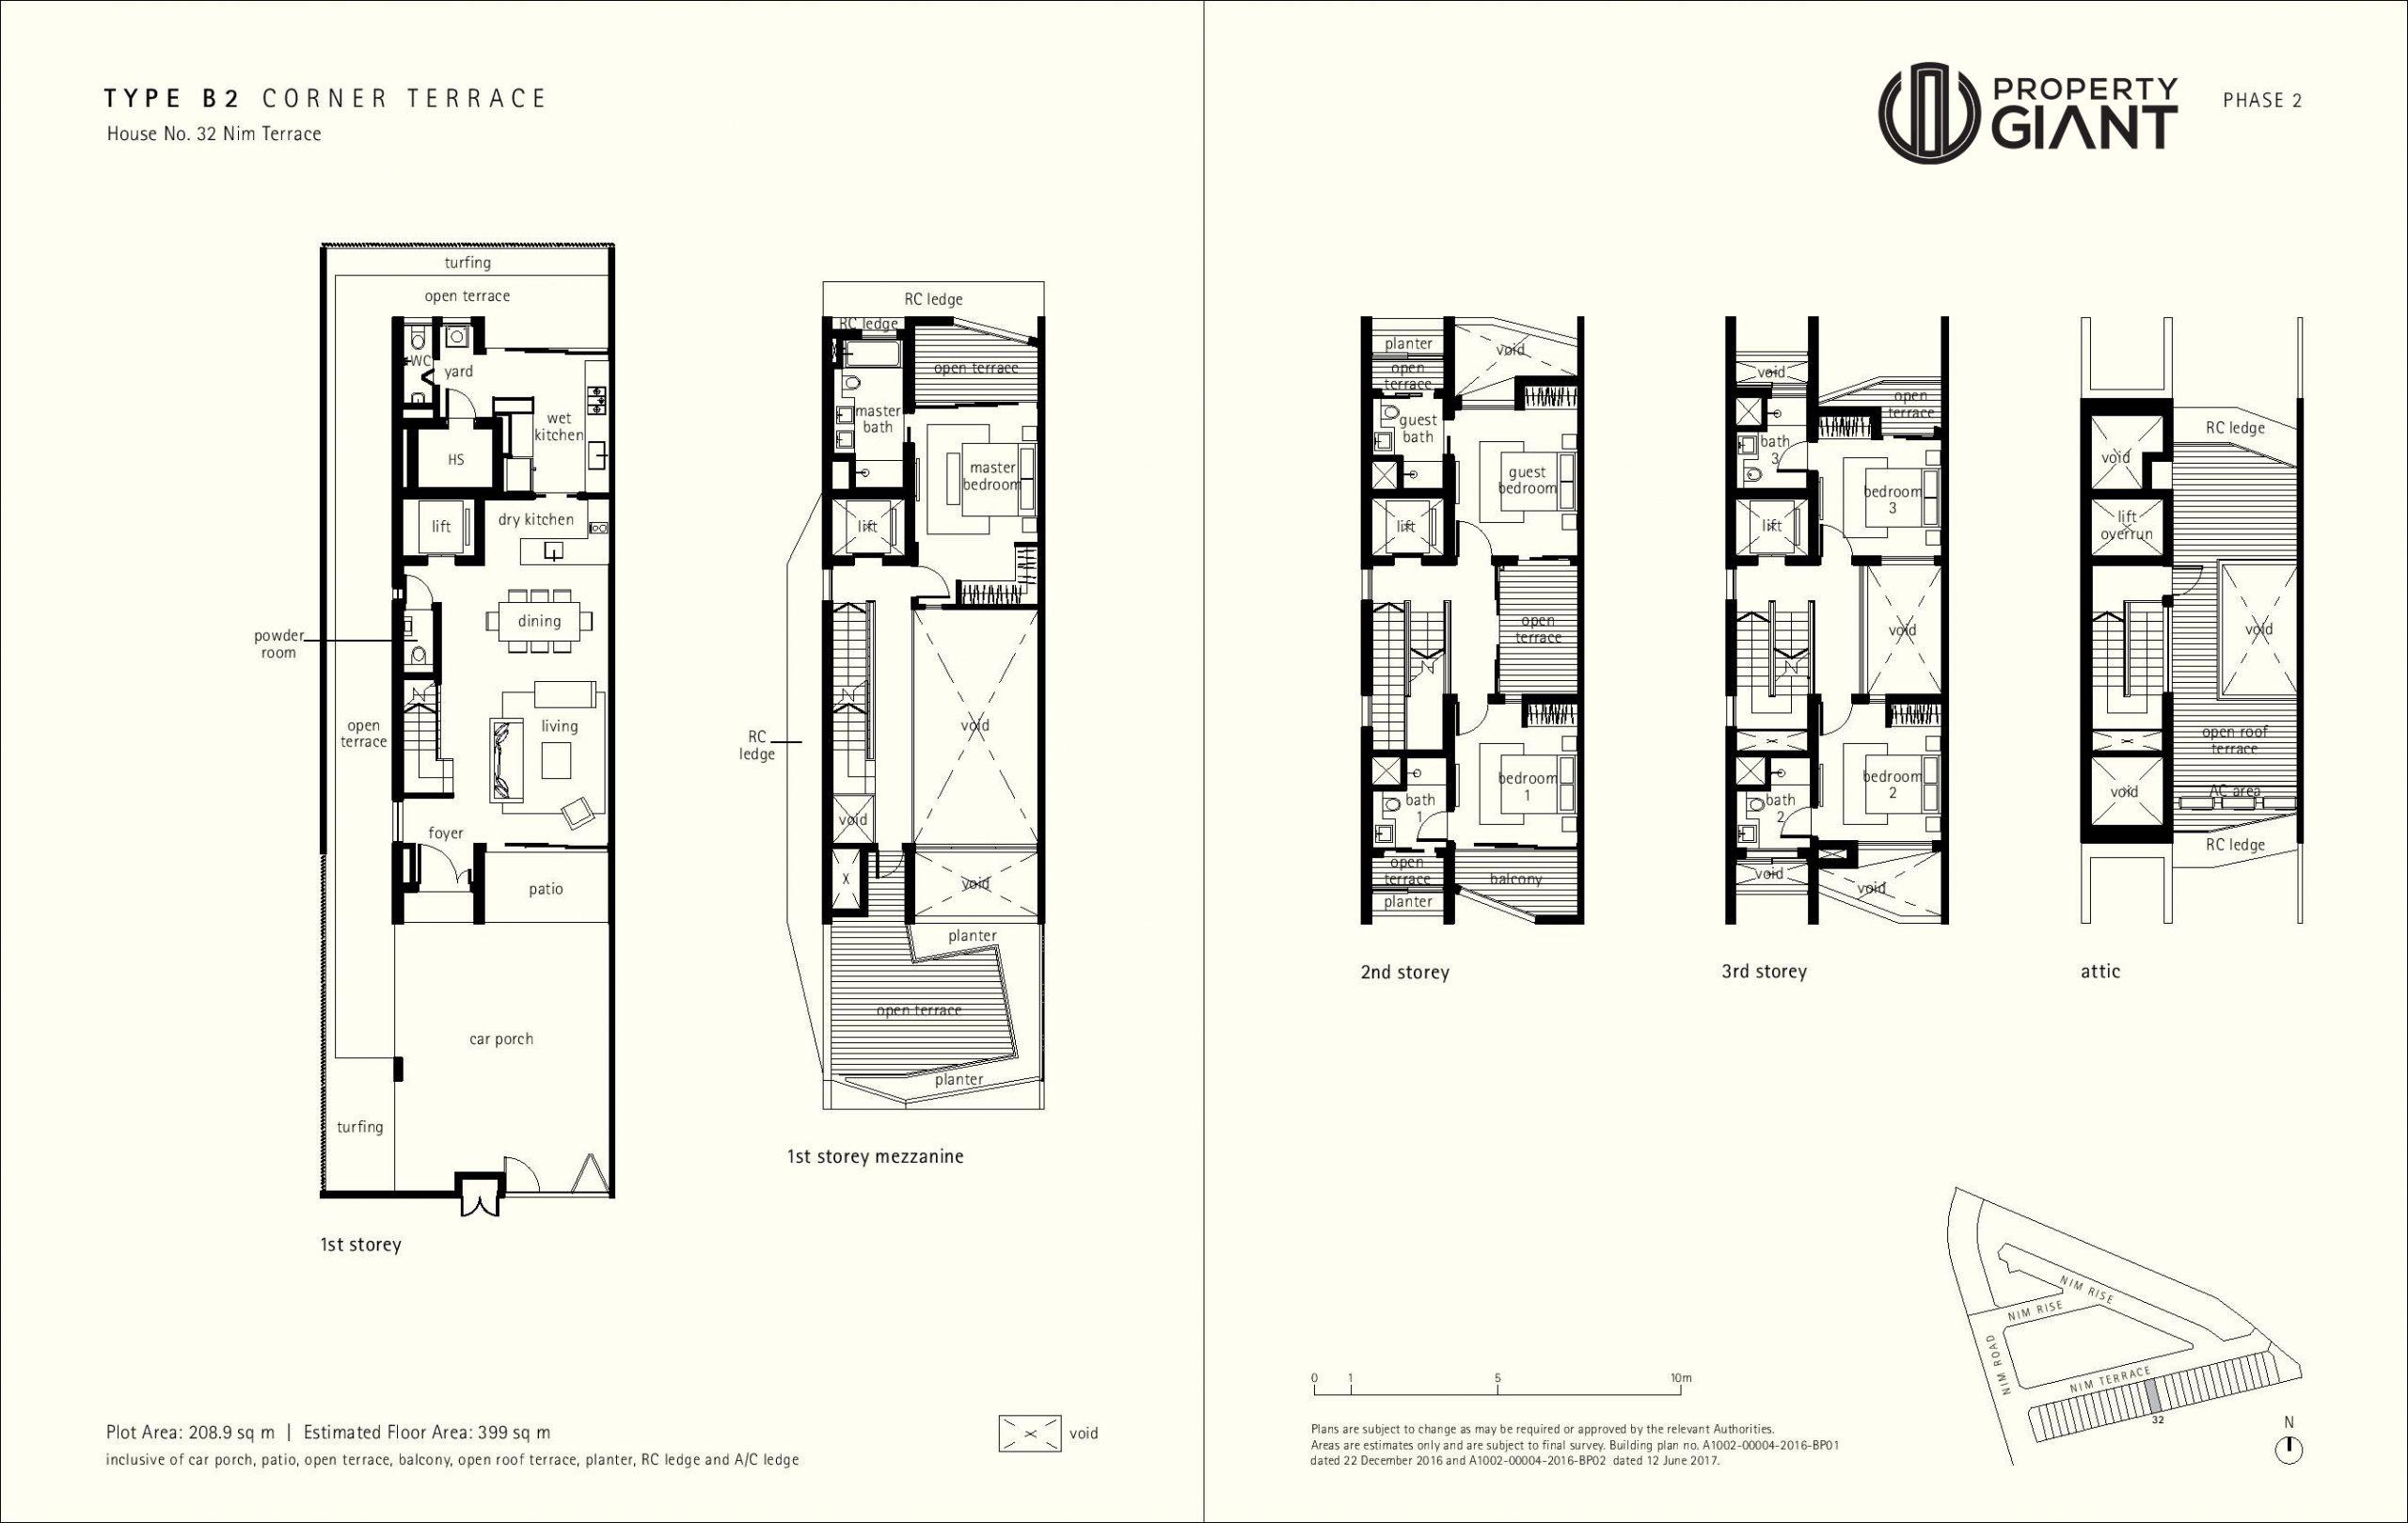 Type B2 - No. 33 Nim Terrace